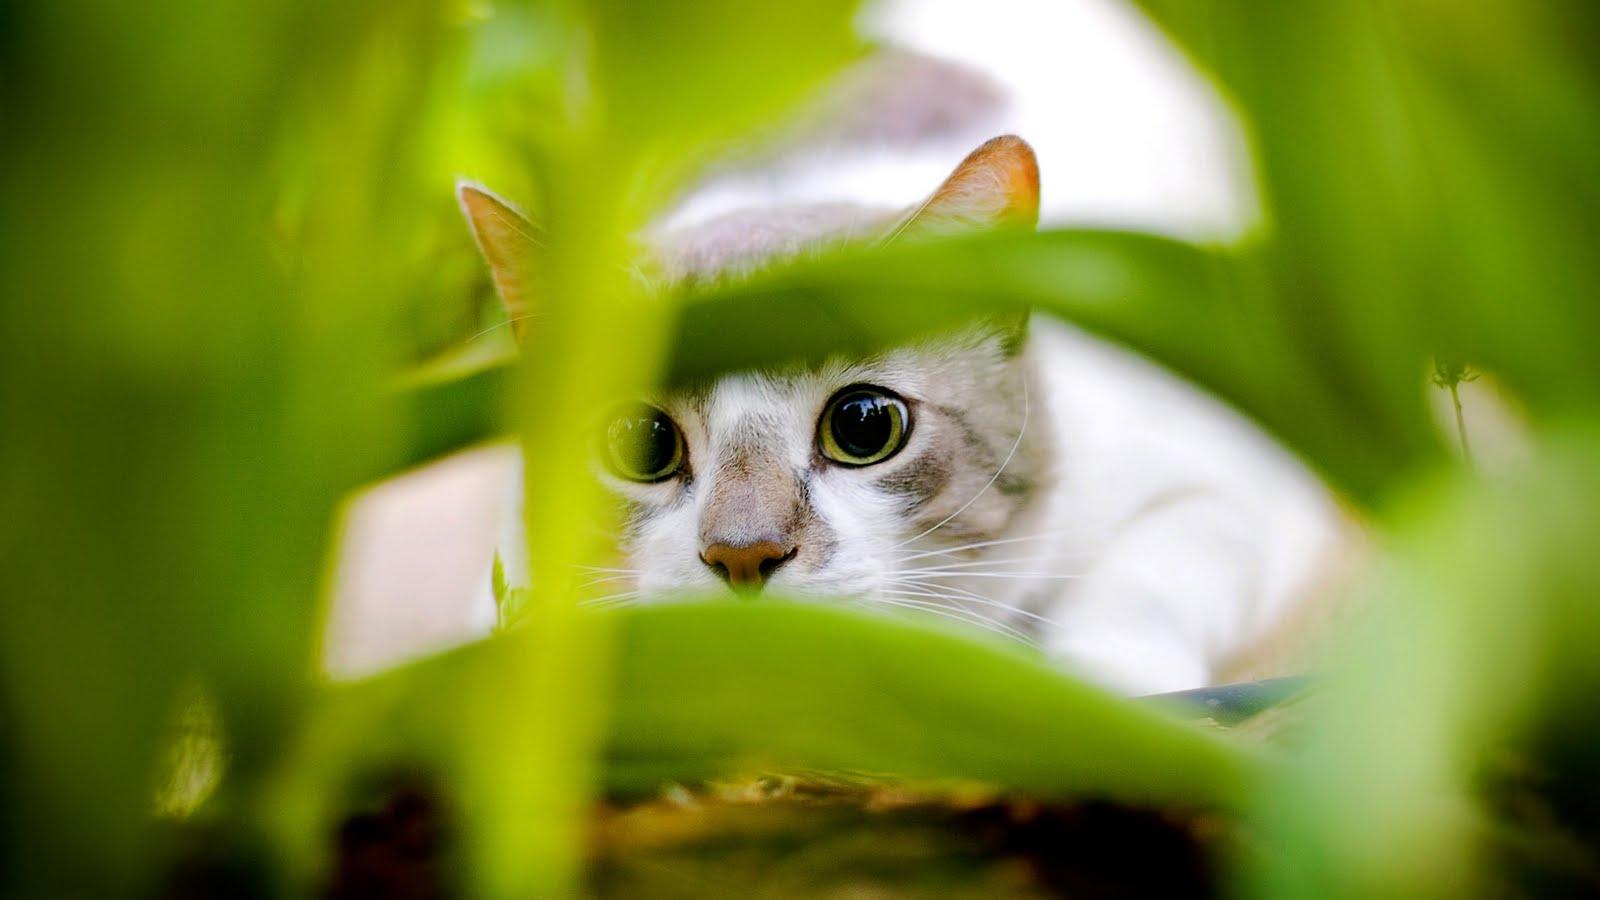 Jaspreet Rekhi 50 Beautiful Cats Full HD Wallpapers 1080prar 1600x900